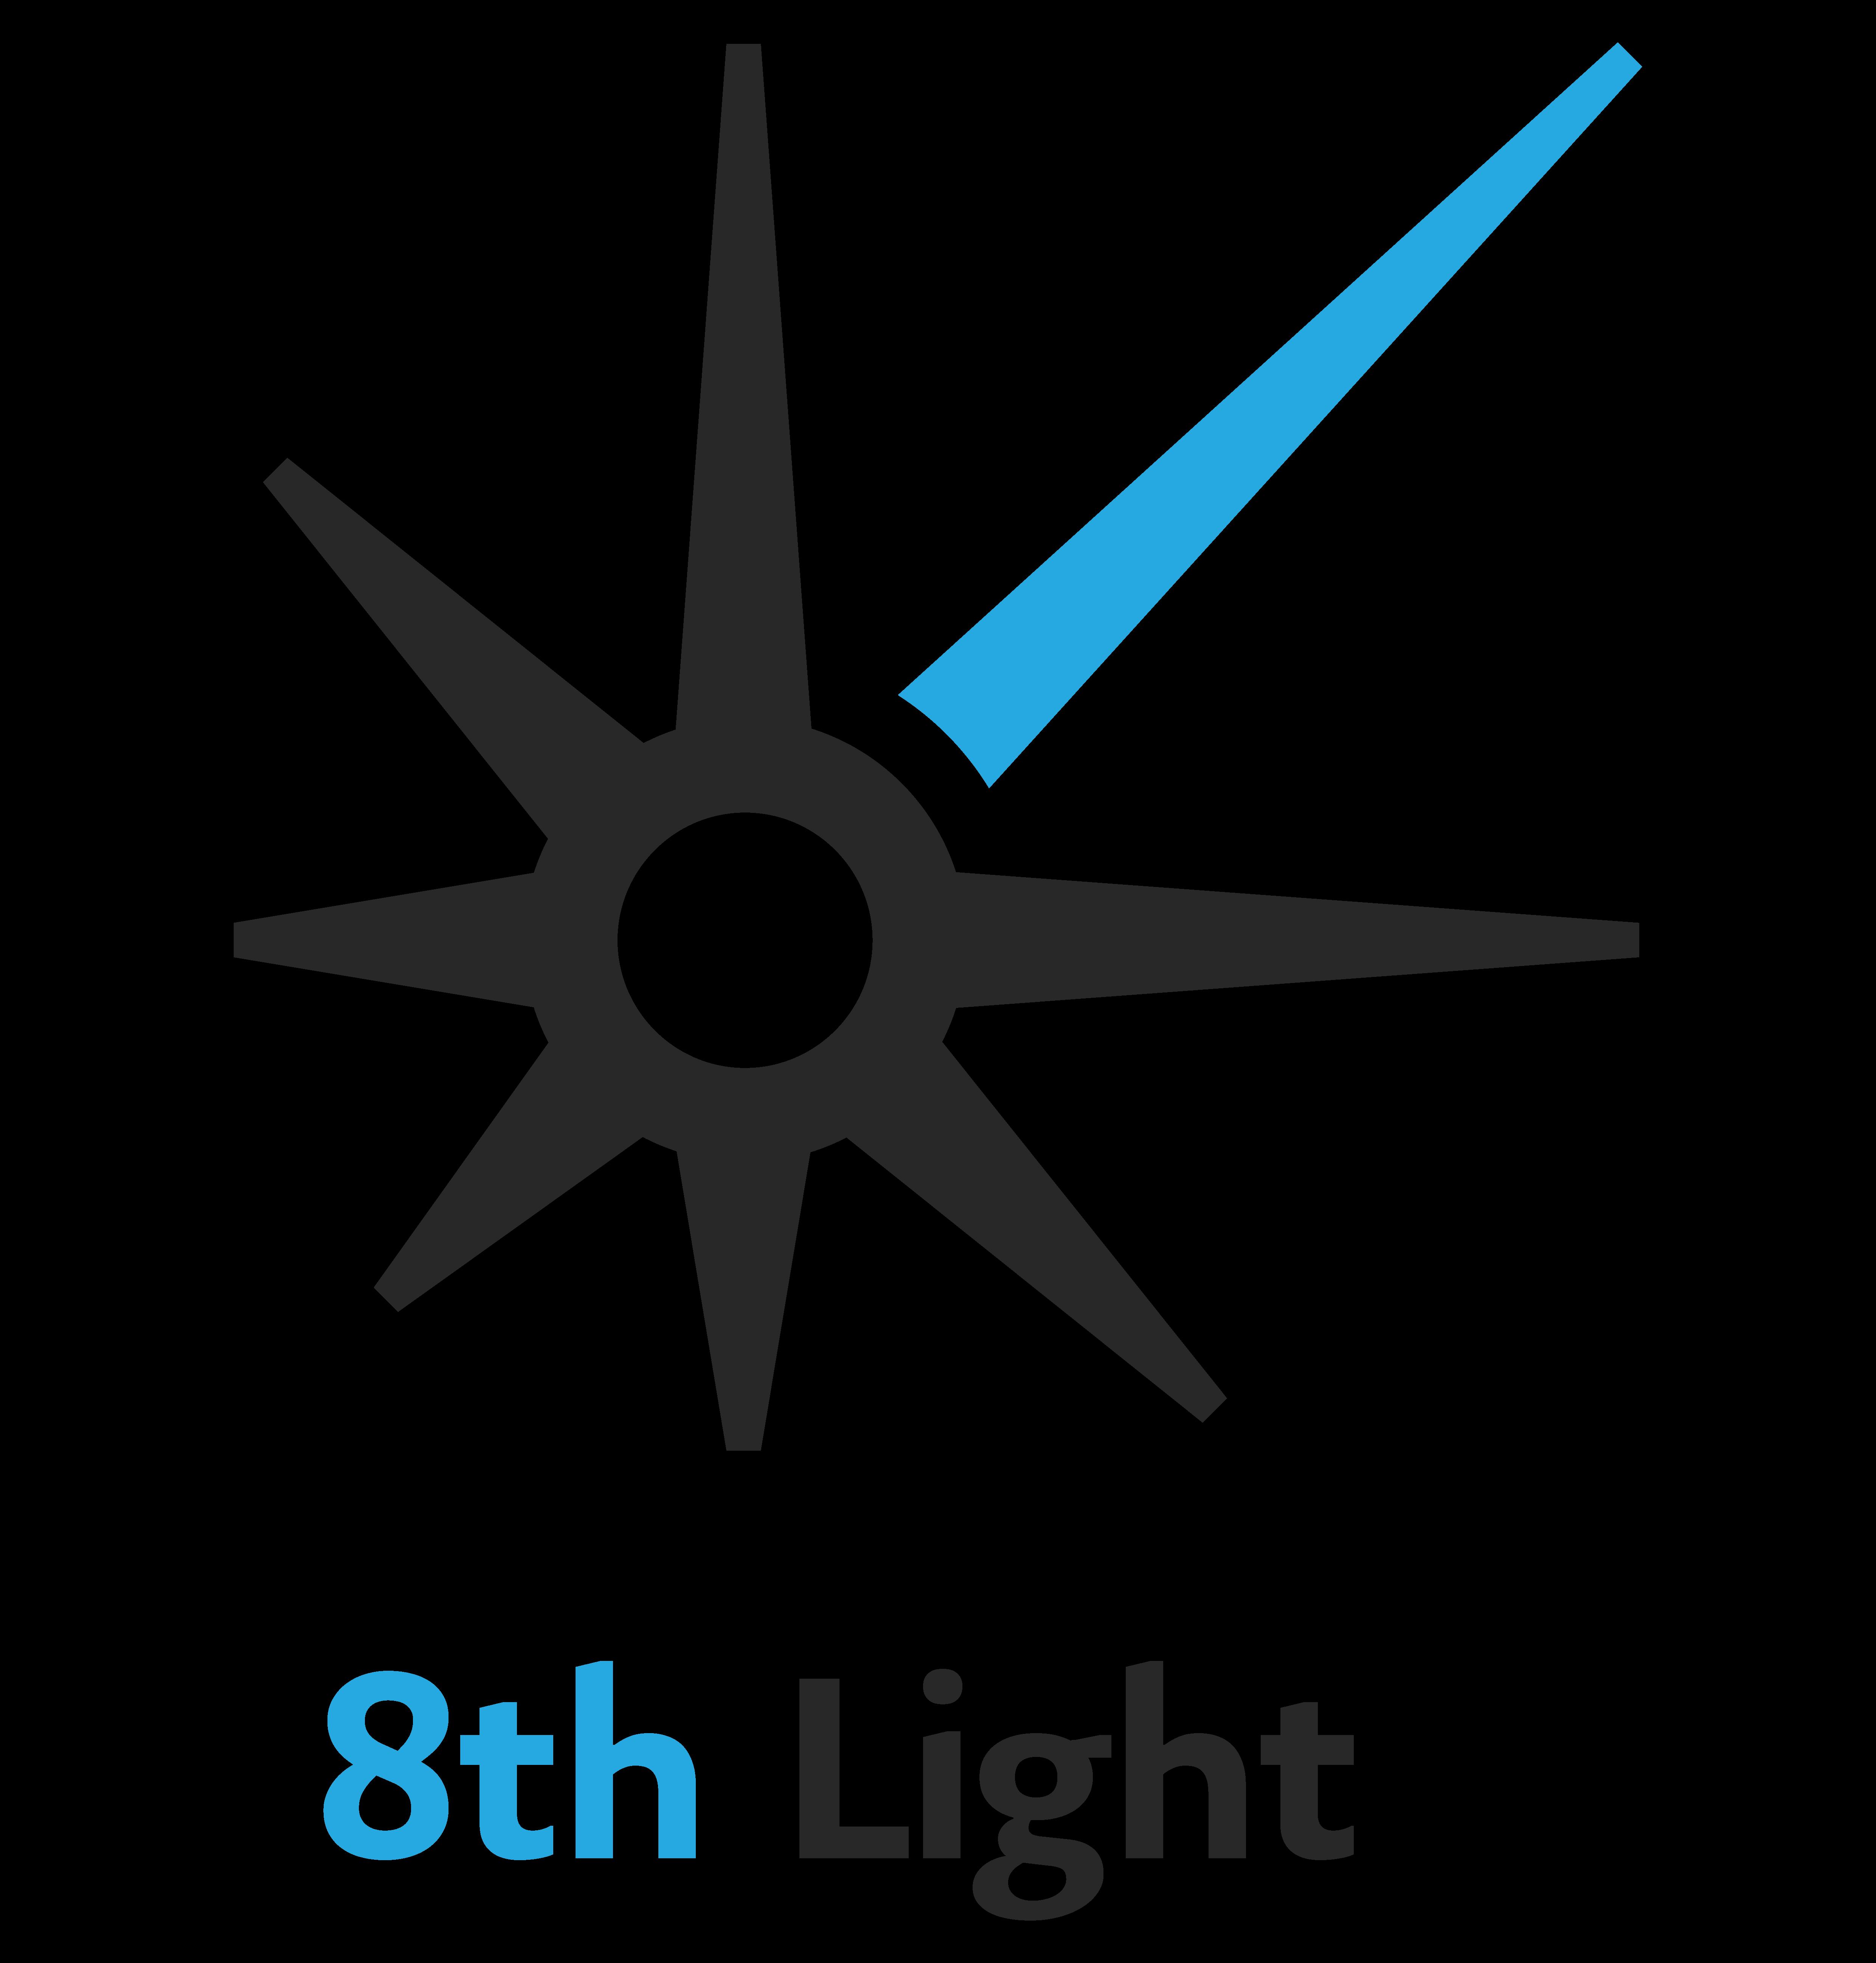 8th light